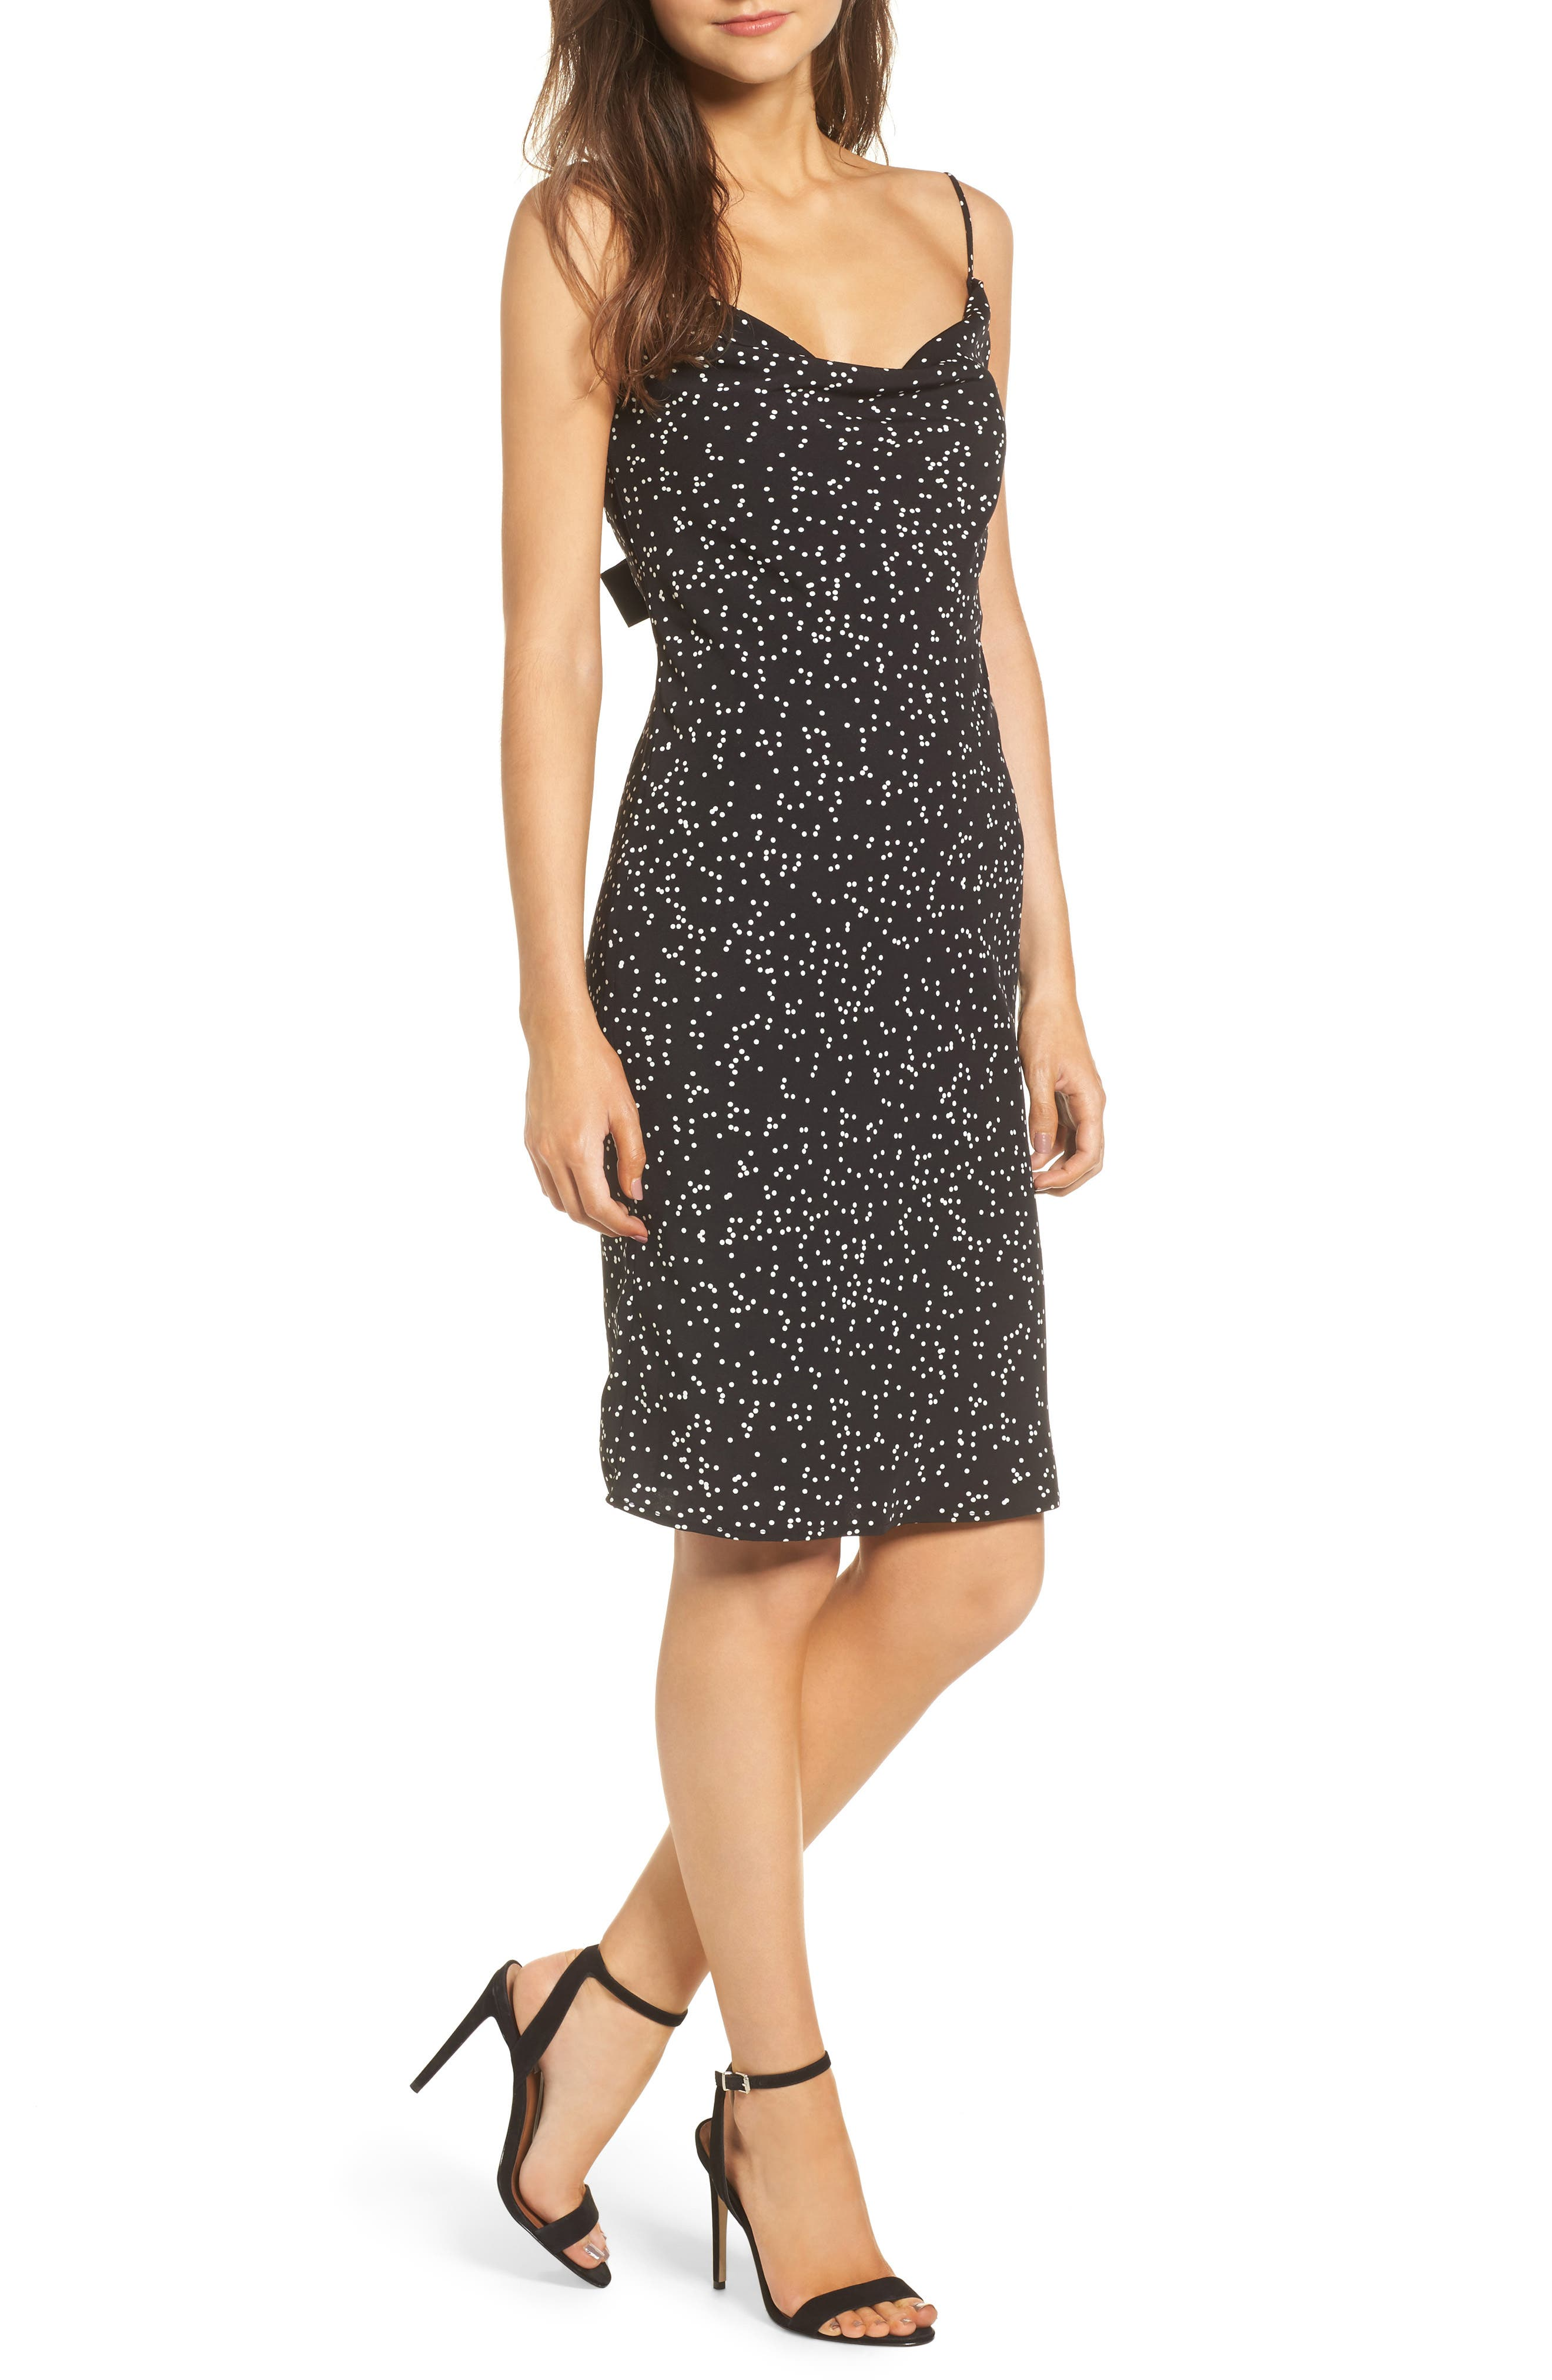 Embrace Me Tie Back Sheath Dress,                             Main thumbnail 1, color,                             Black W White Spot